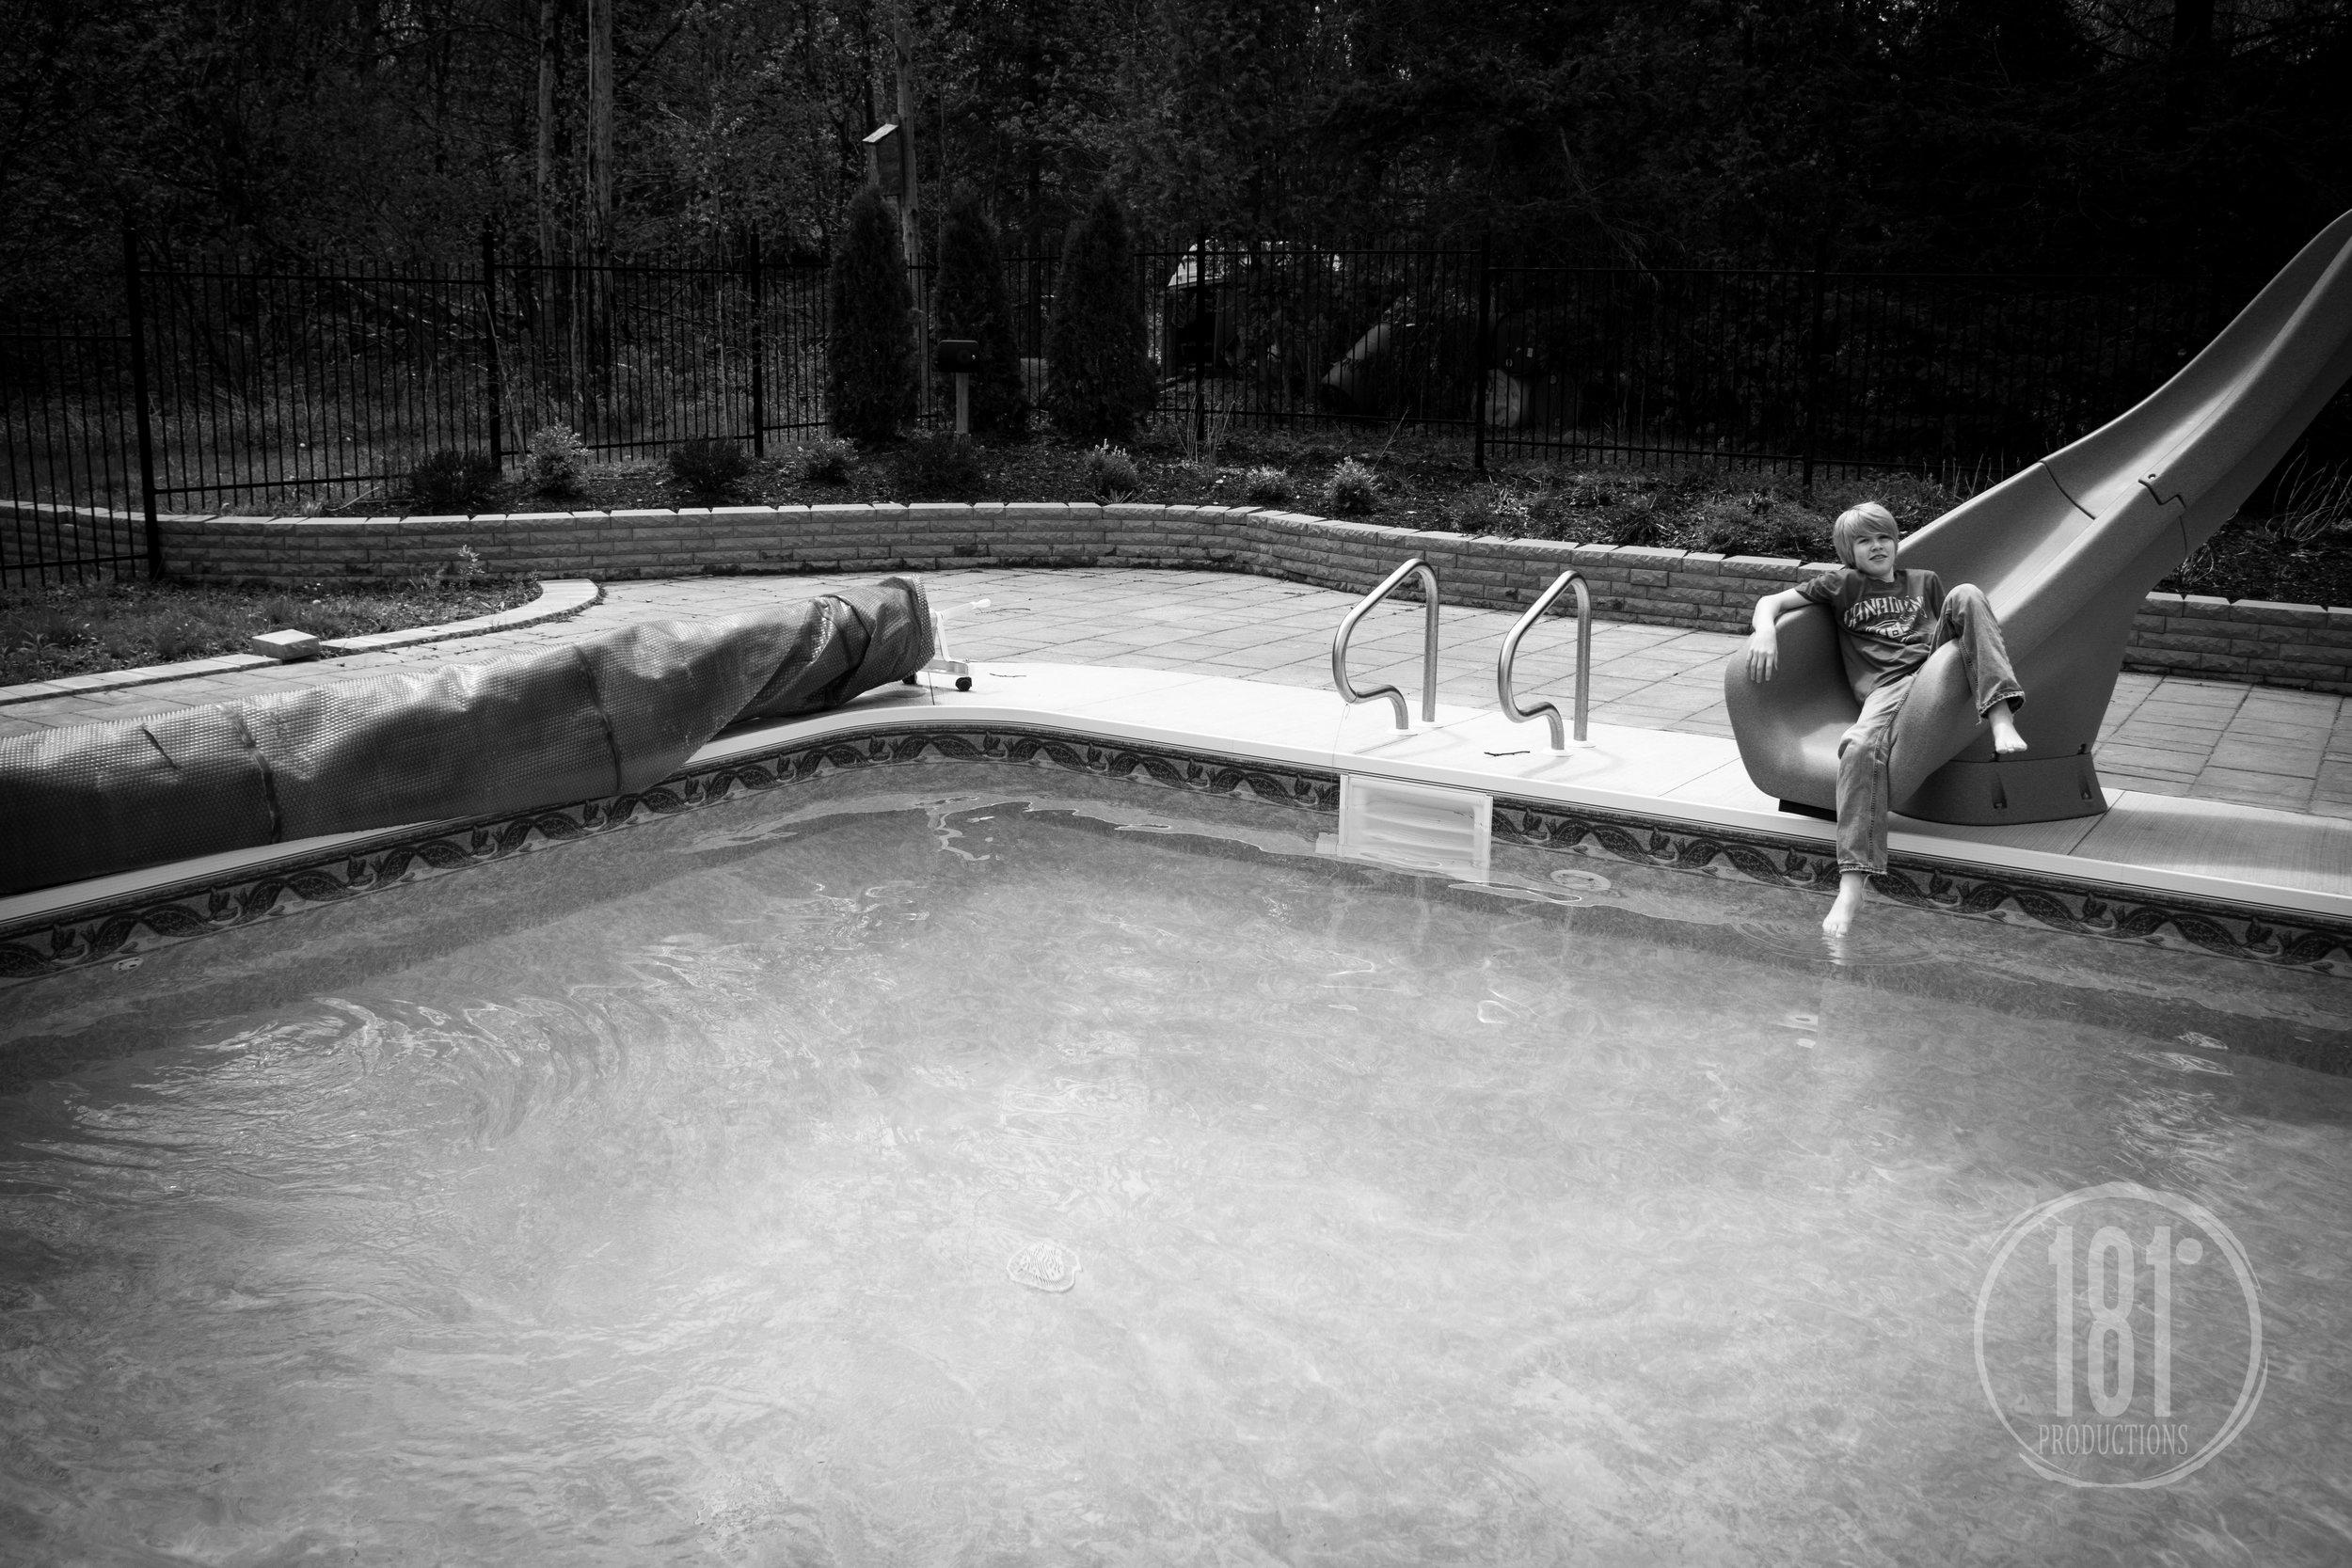 mackinnonfamilyphotos_may19-2013_watermarked-70.jpg